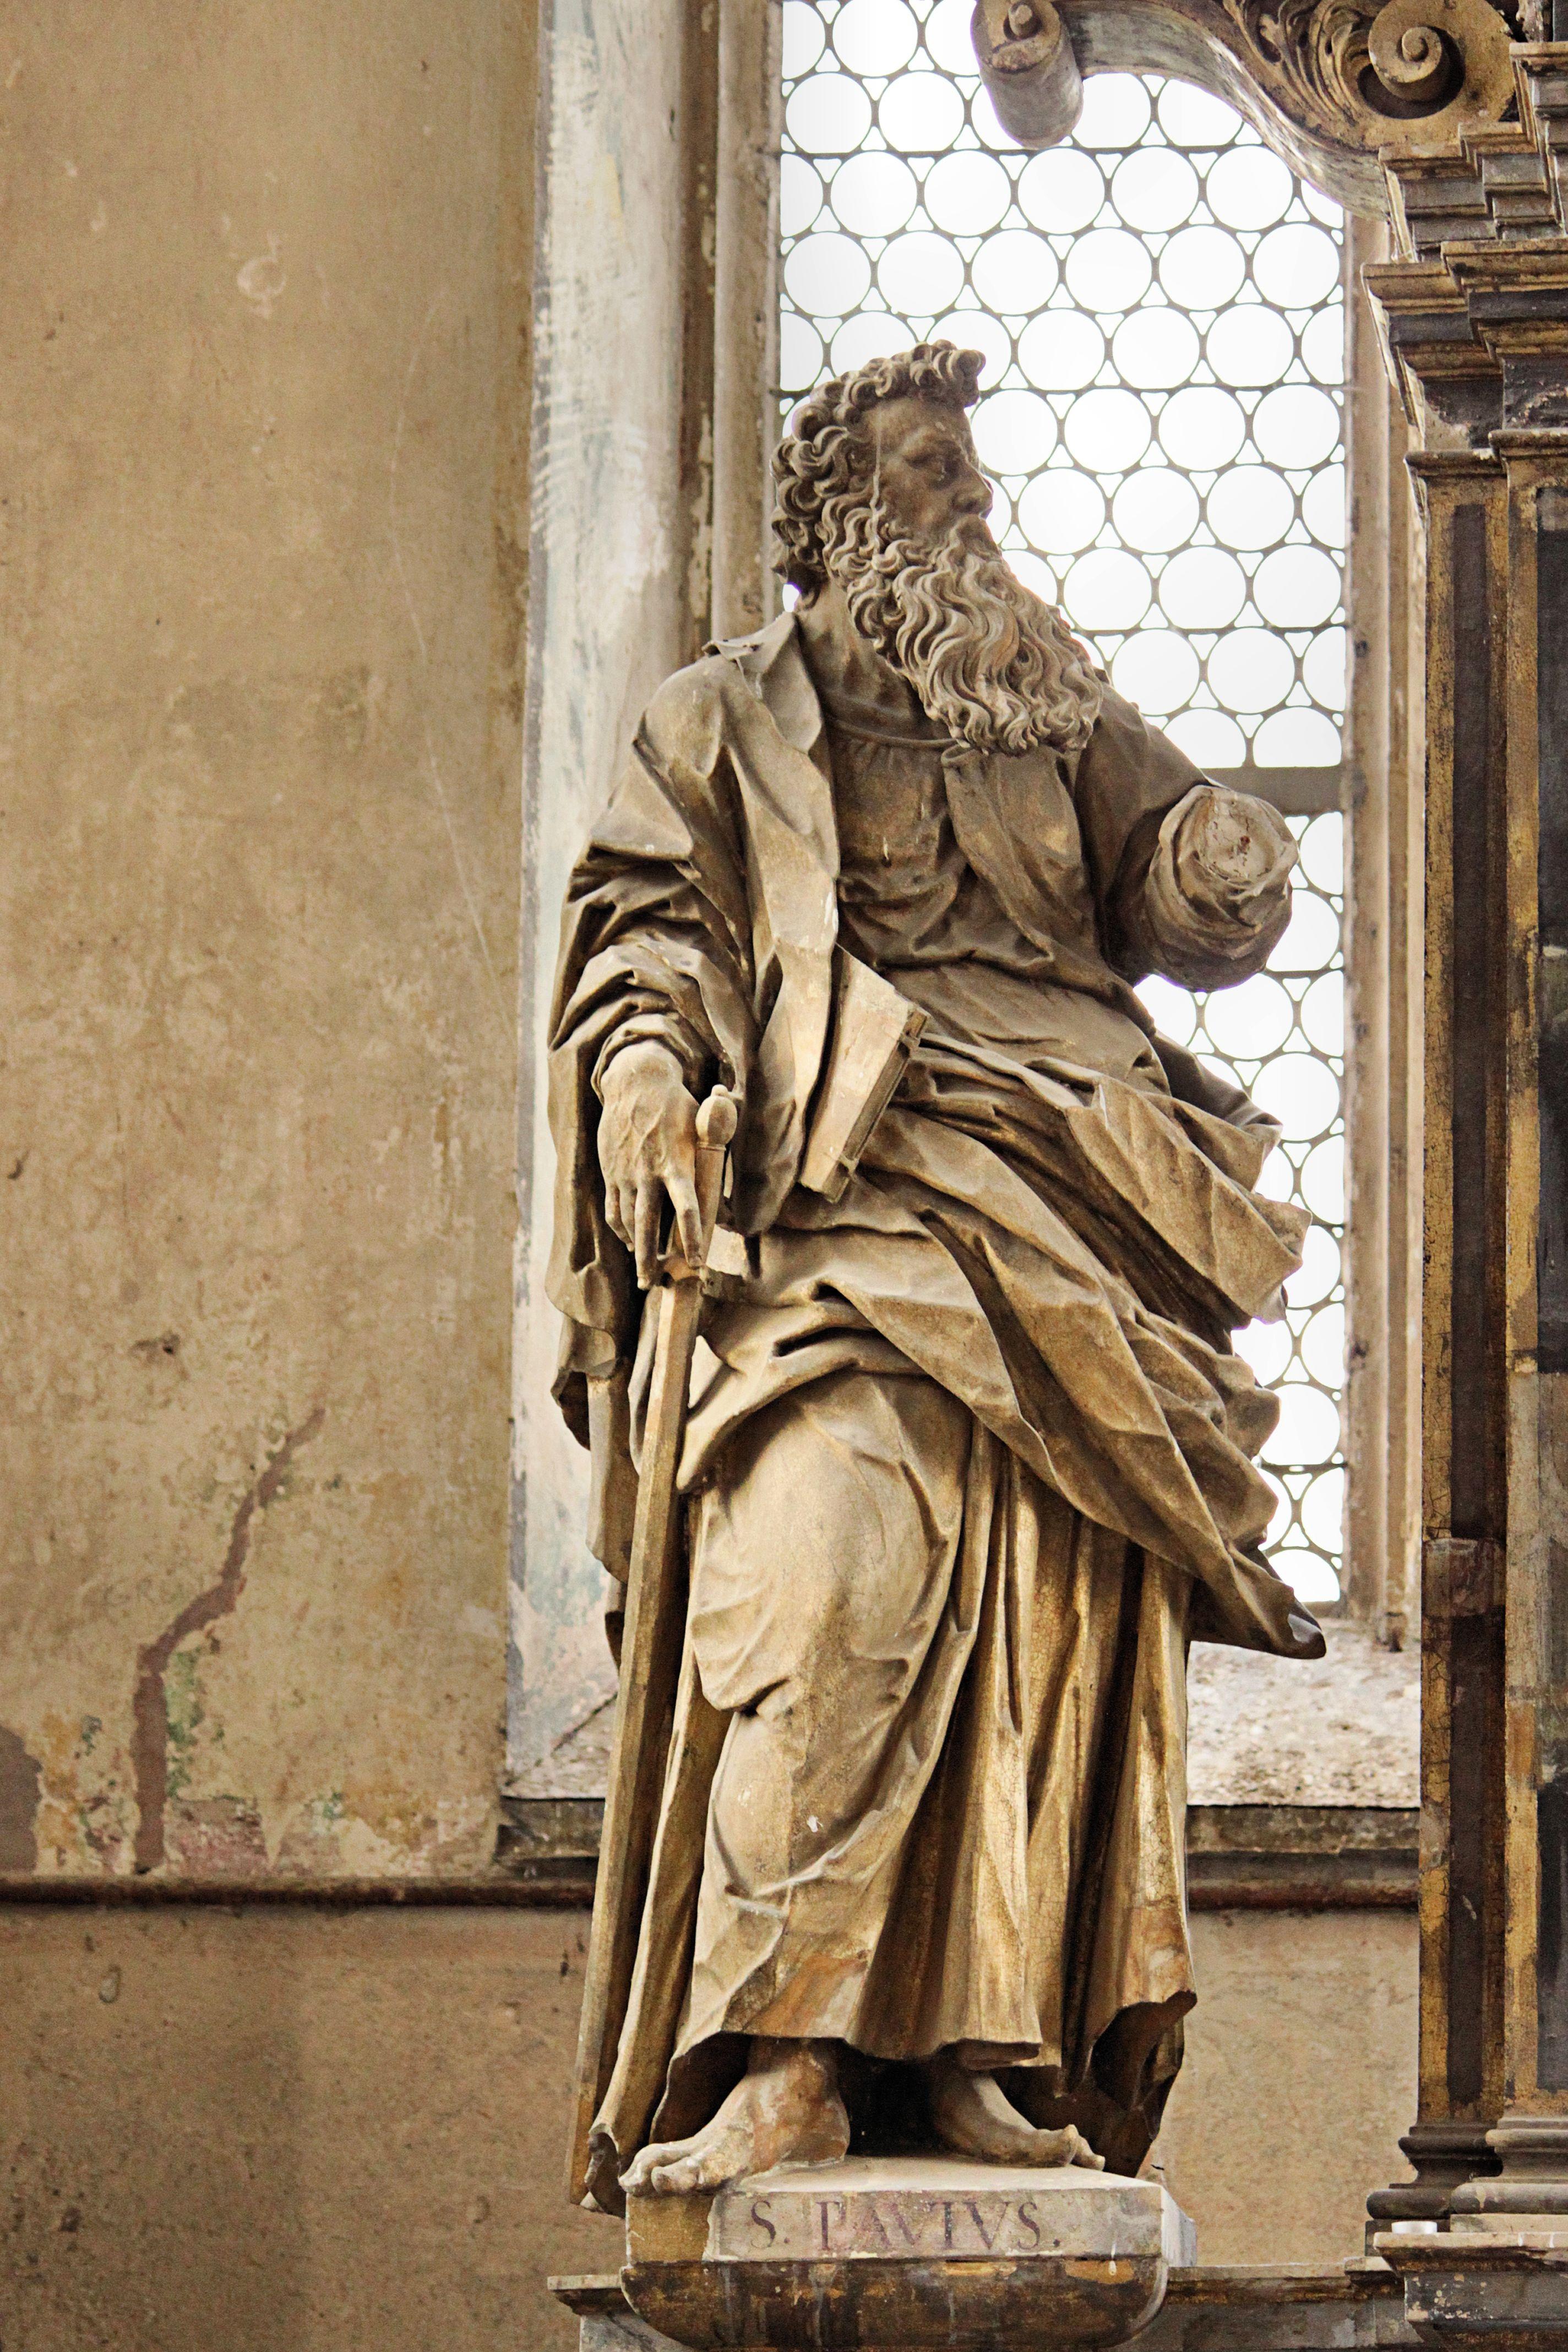 Gambar : Monumen, agama, Kristen, raja, seni, Candi, foto ...